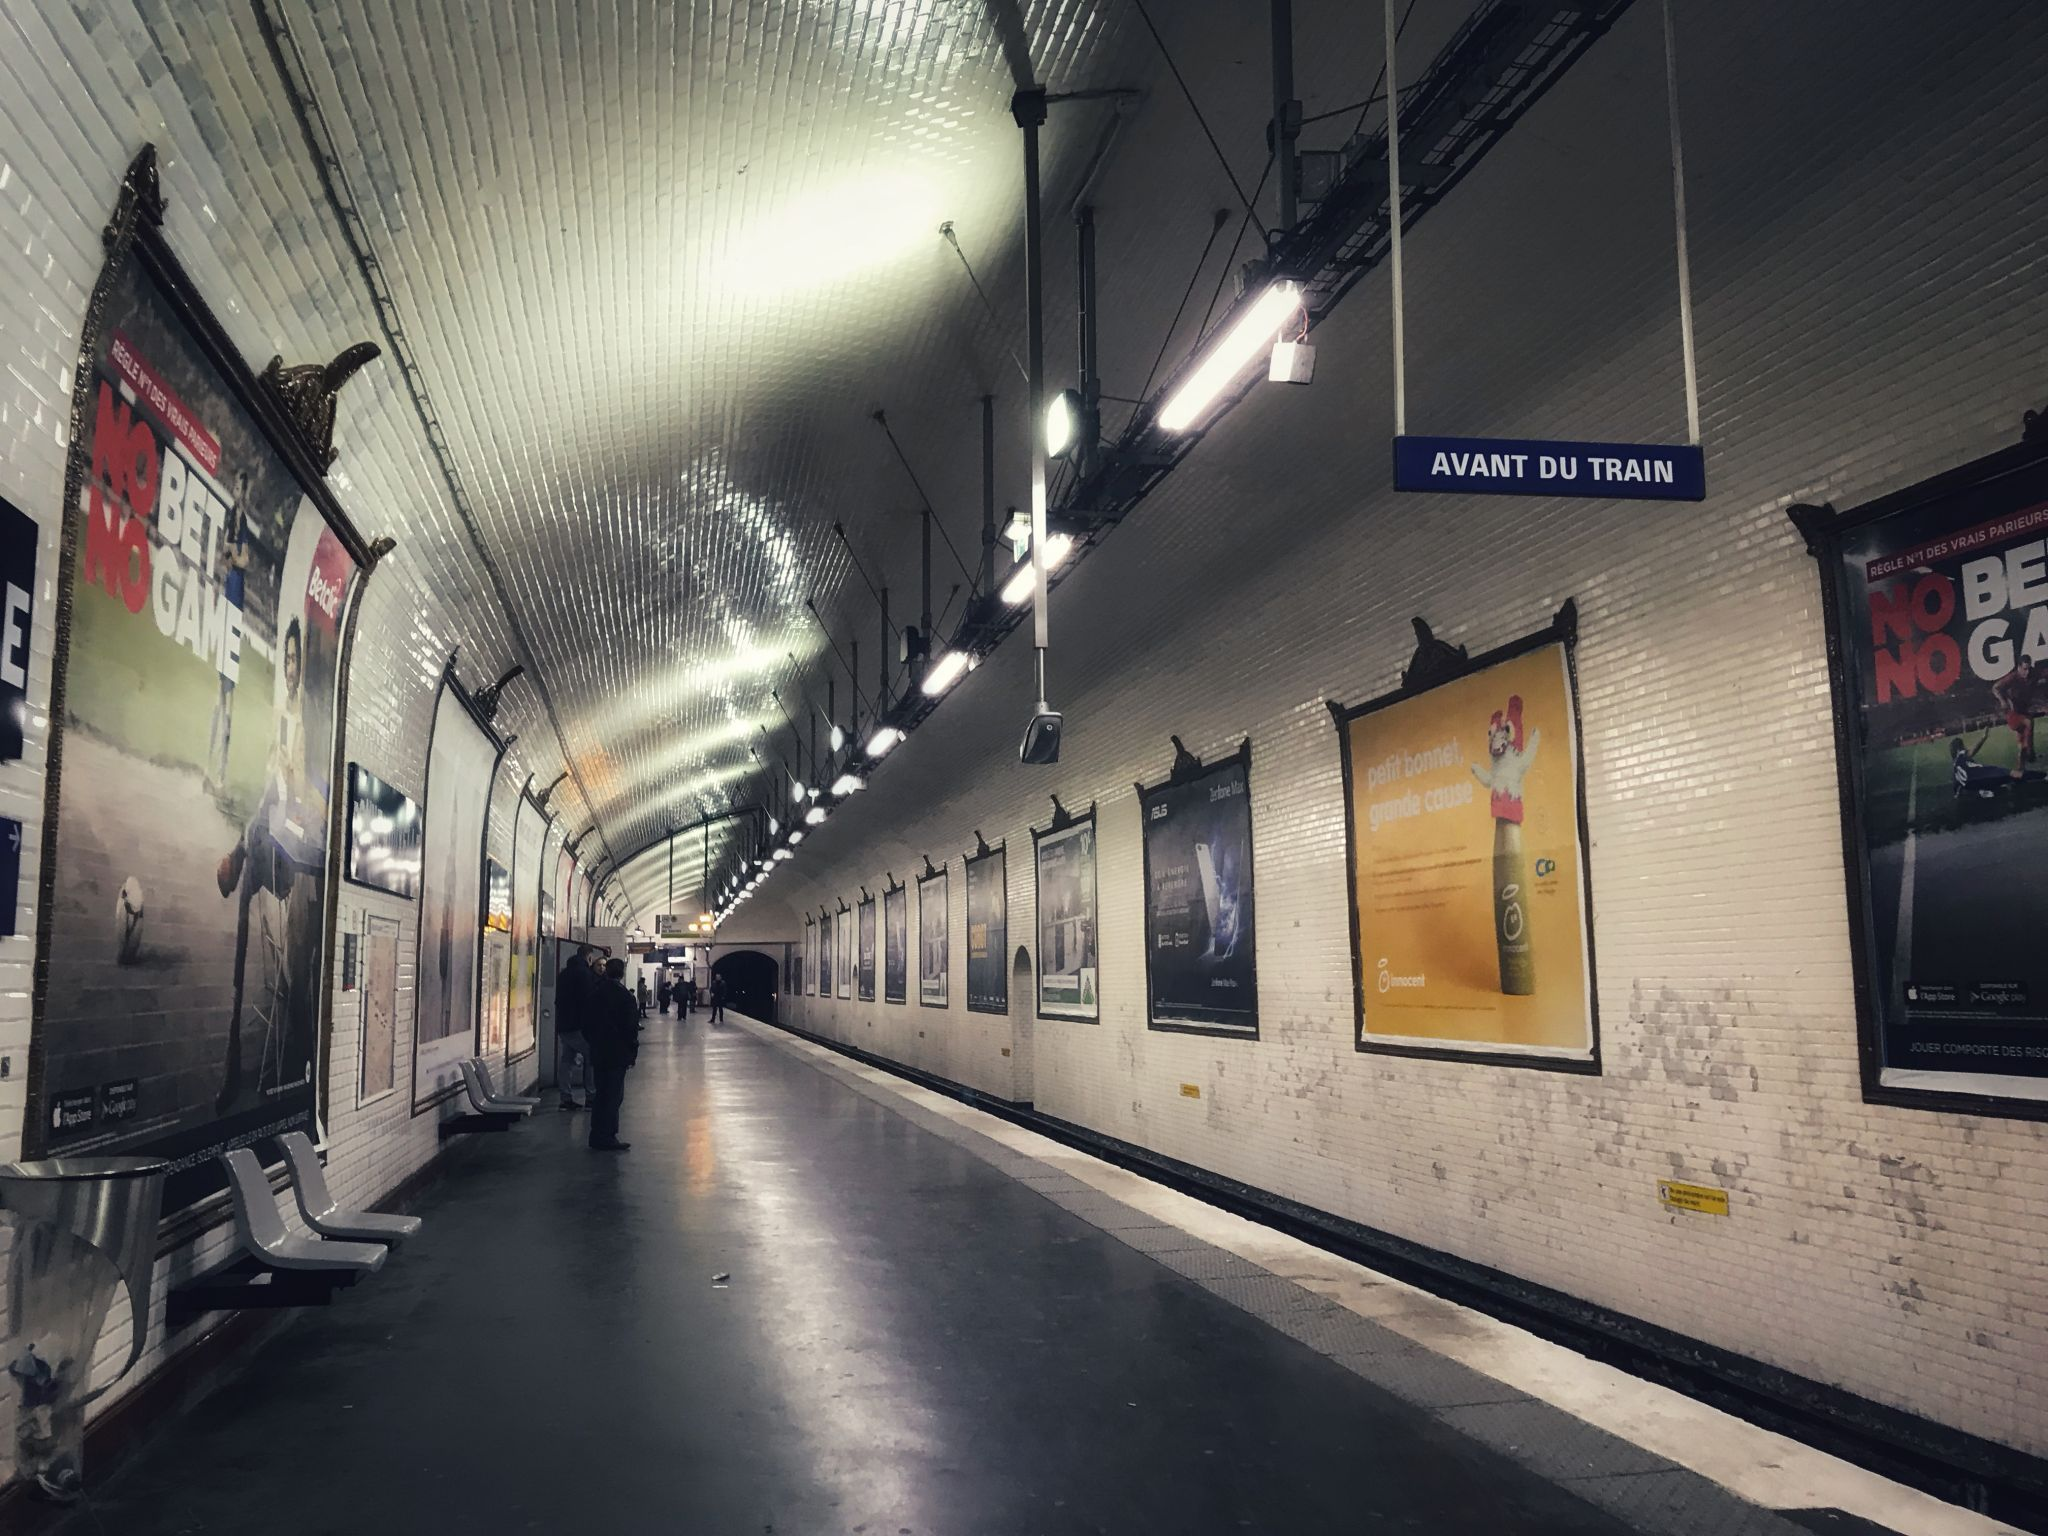 Paris metro station Platform